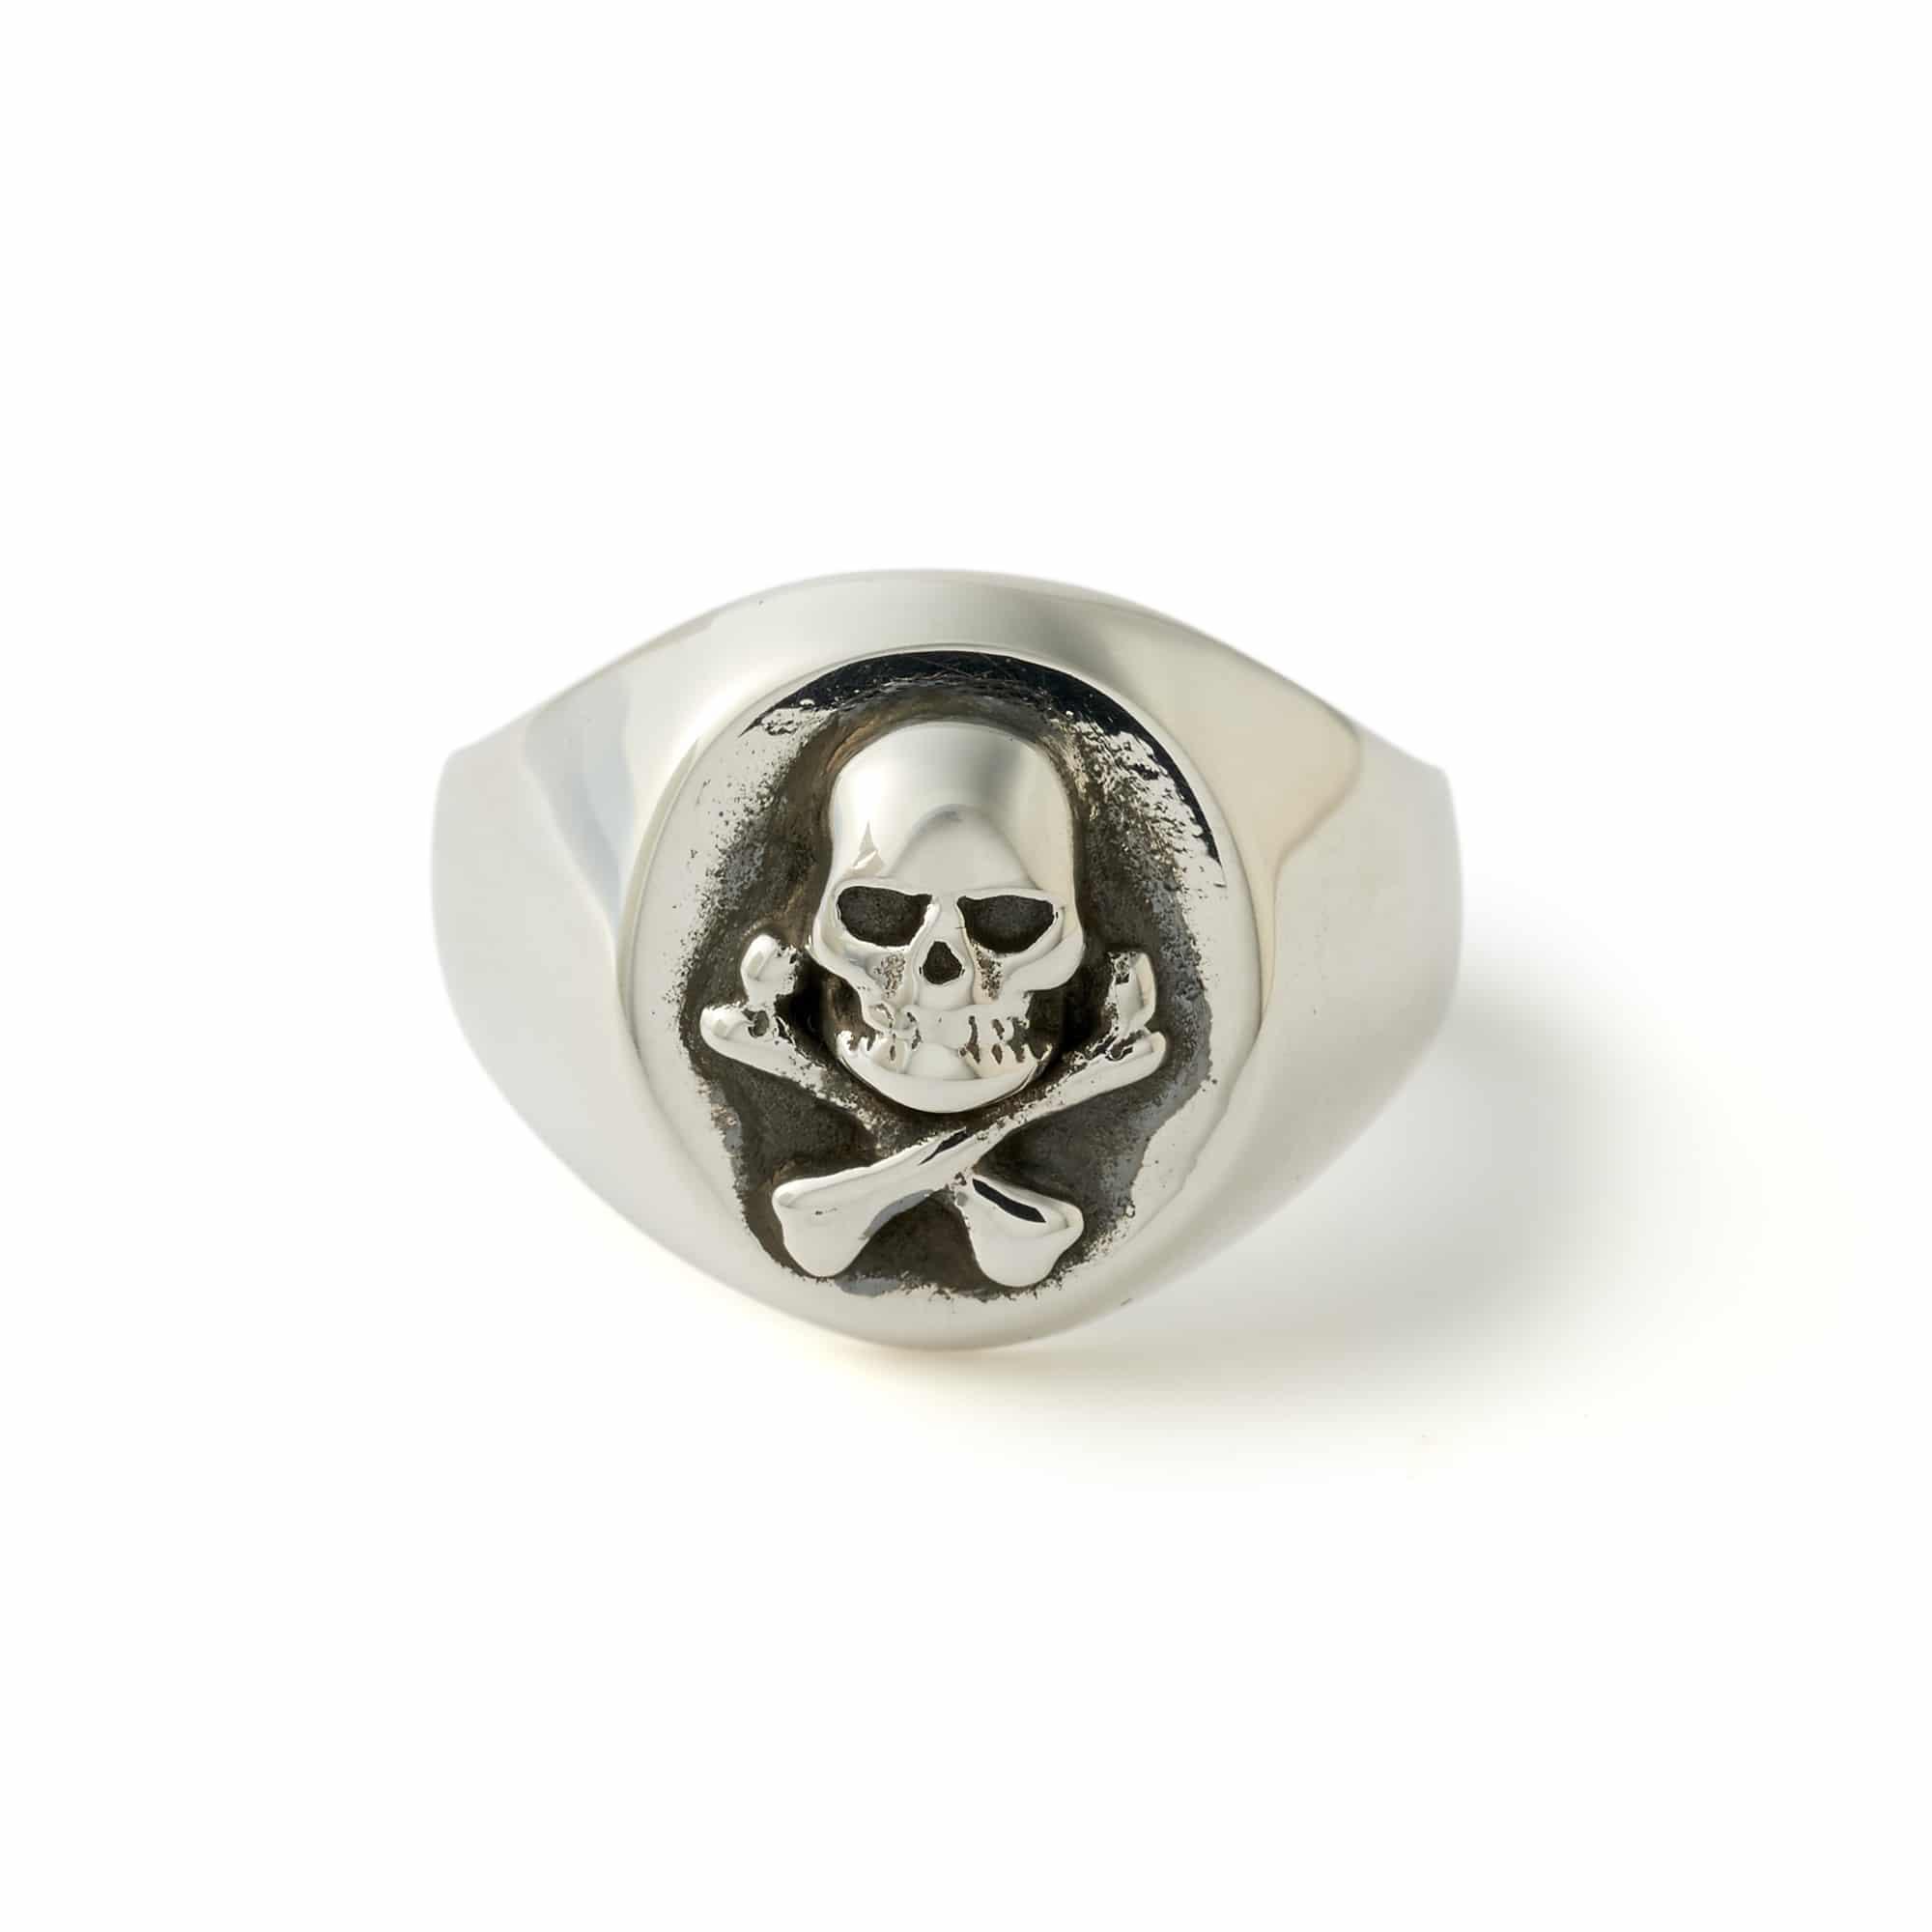 All Silver Skull & Crossbones Signet Ring – The Great Frog